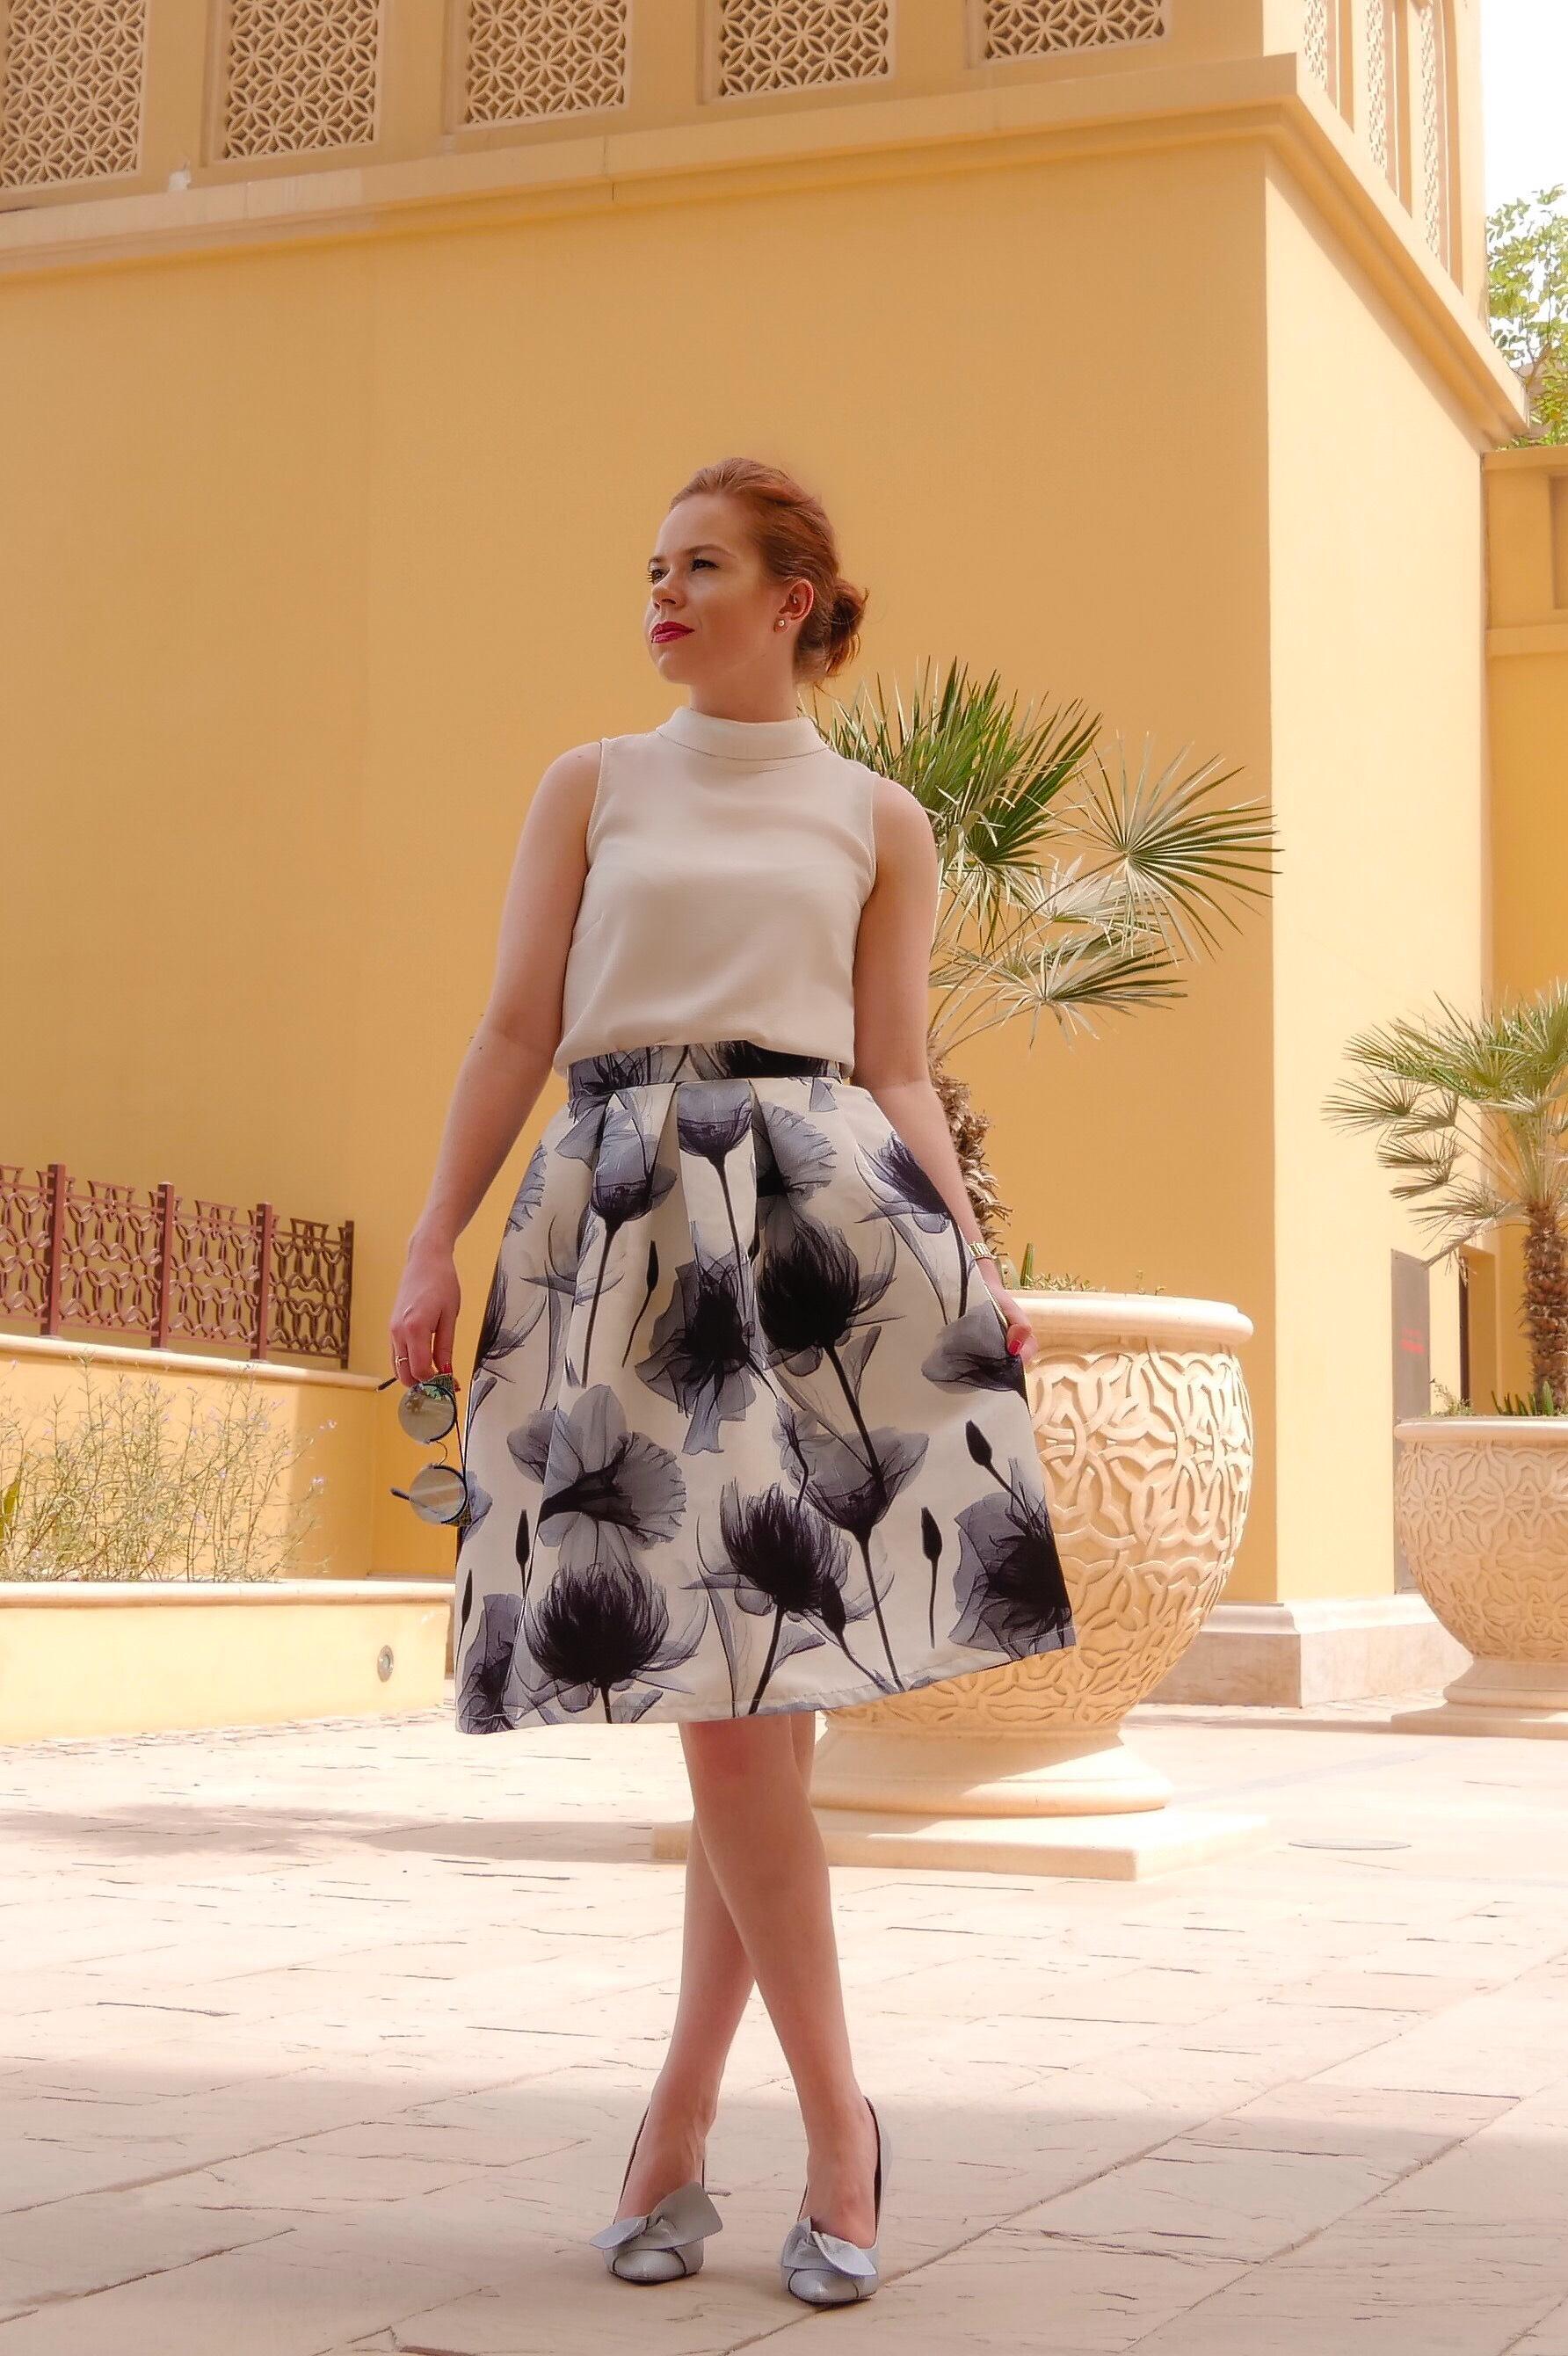 deals in high heels - corporate hustle and office fashion - briar prestidge